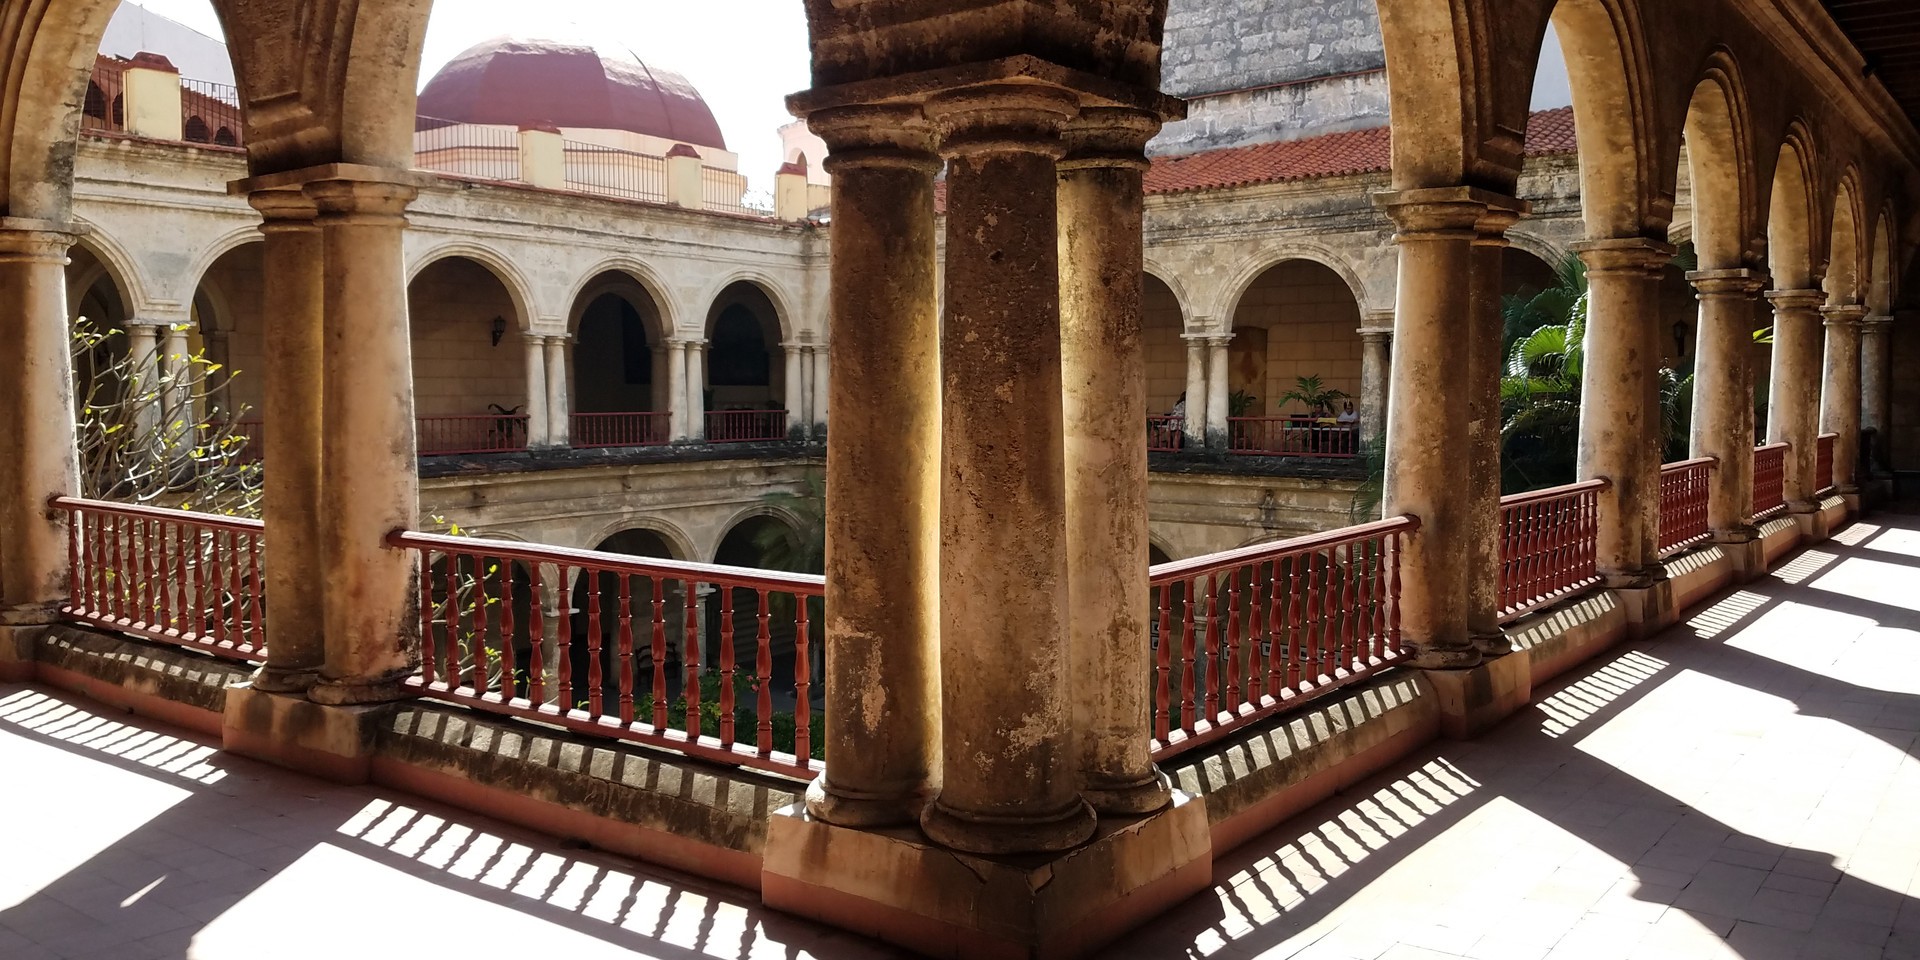 Office of the Catholic Bishop in Havana